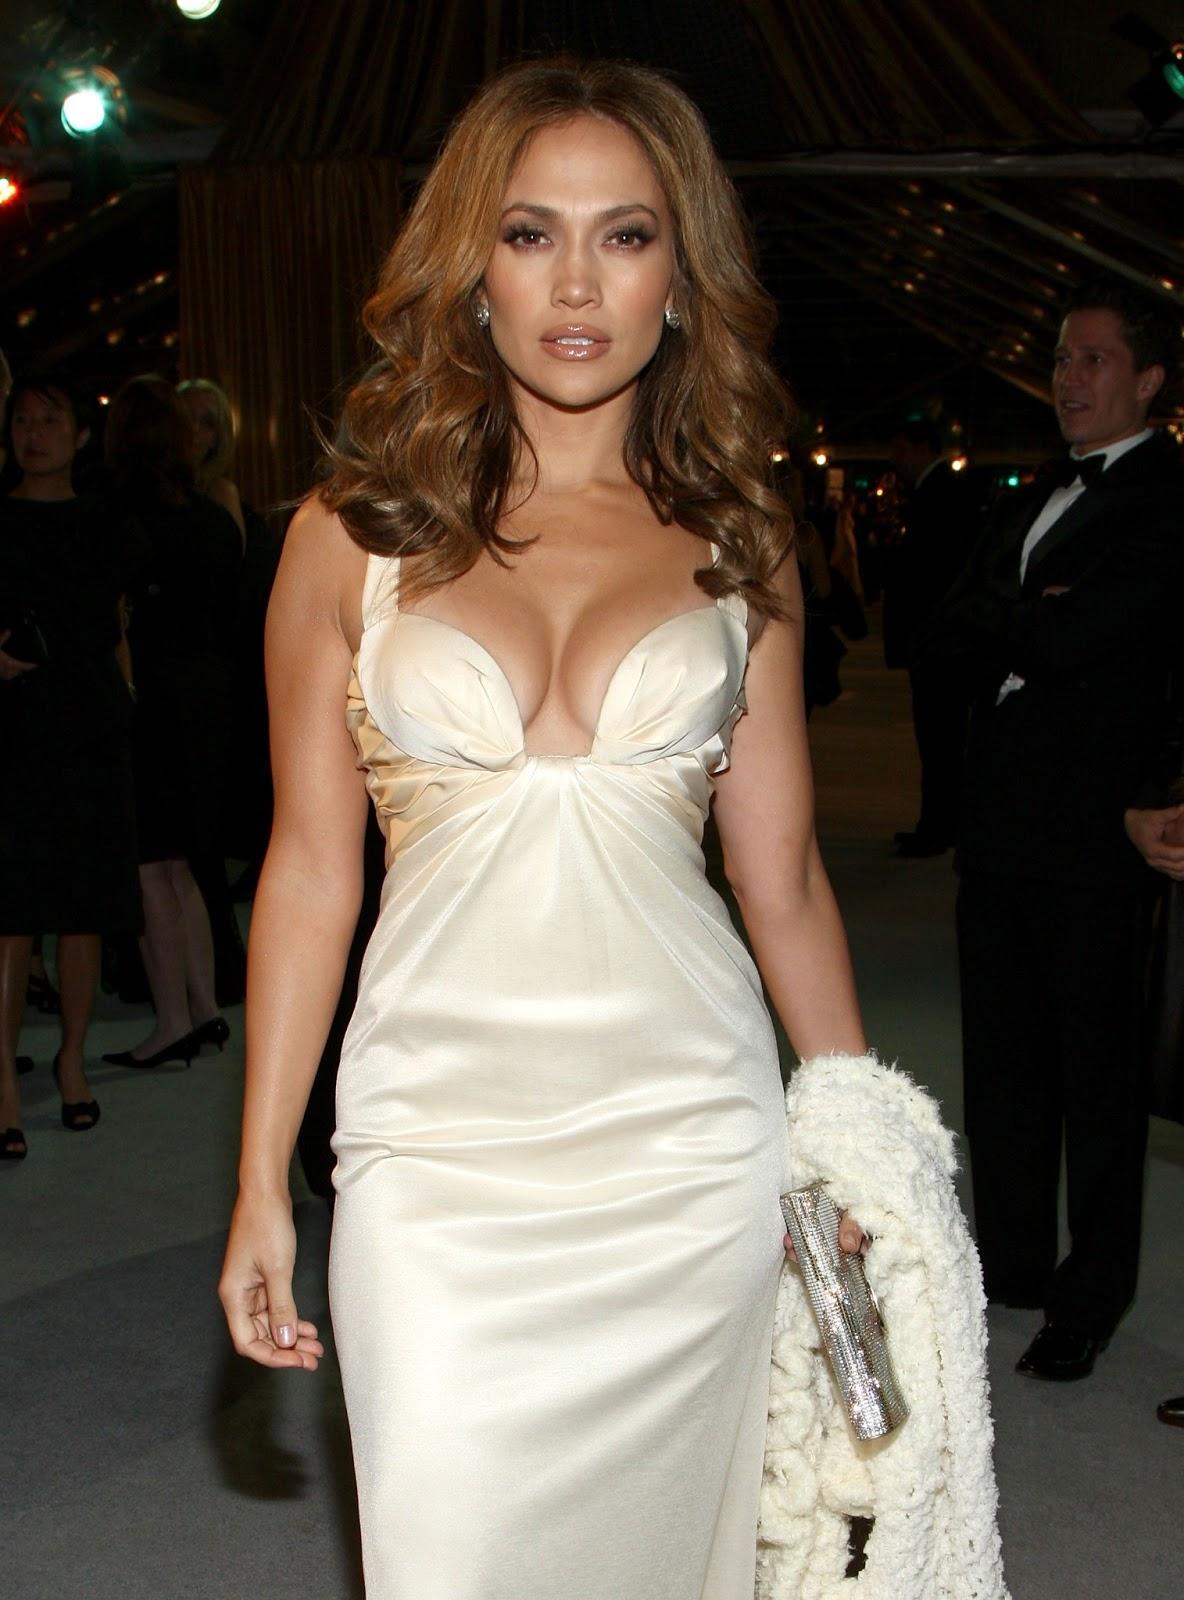 Hot Actress, Models, Heroine And Celebrities Hot Photos -7785